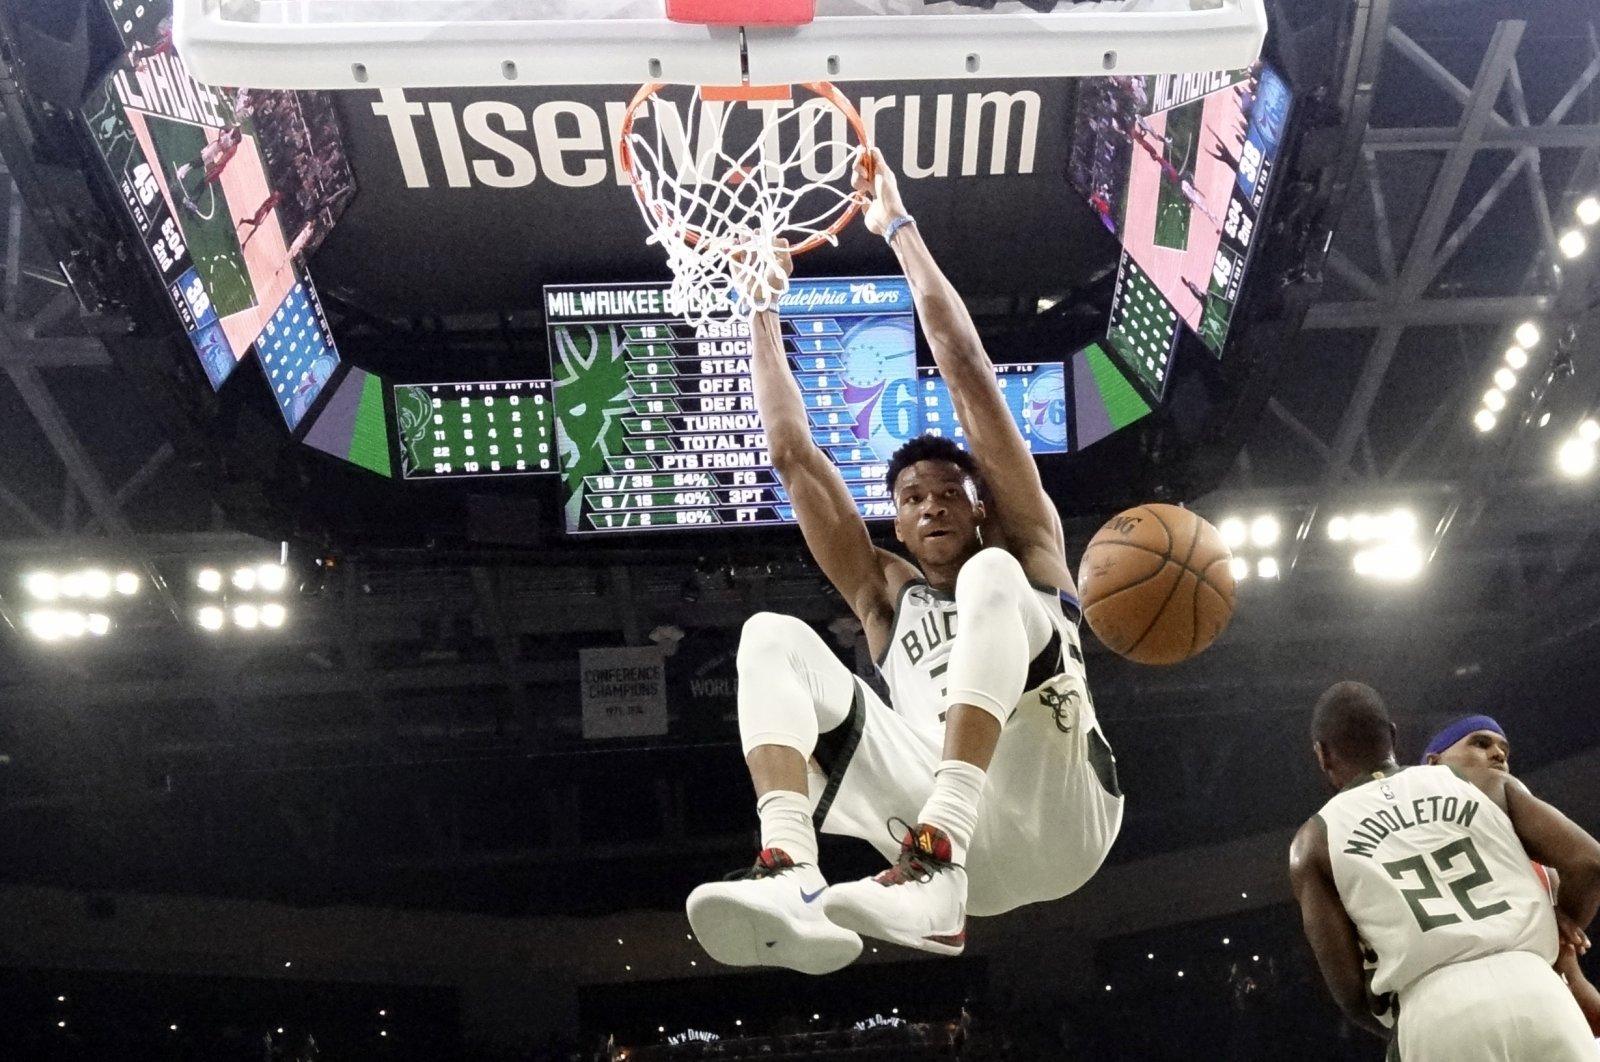 Milwaukee Bucks' Giannis Antetokounmpo dunks during an NBA game in Milwaukee, Wisconsin, U.S, Feb. 22, 2020. (AP Photo)